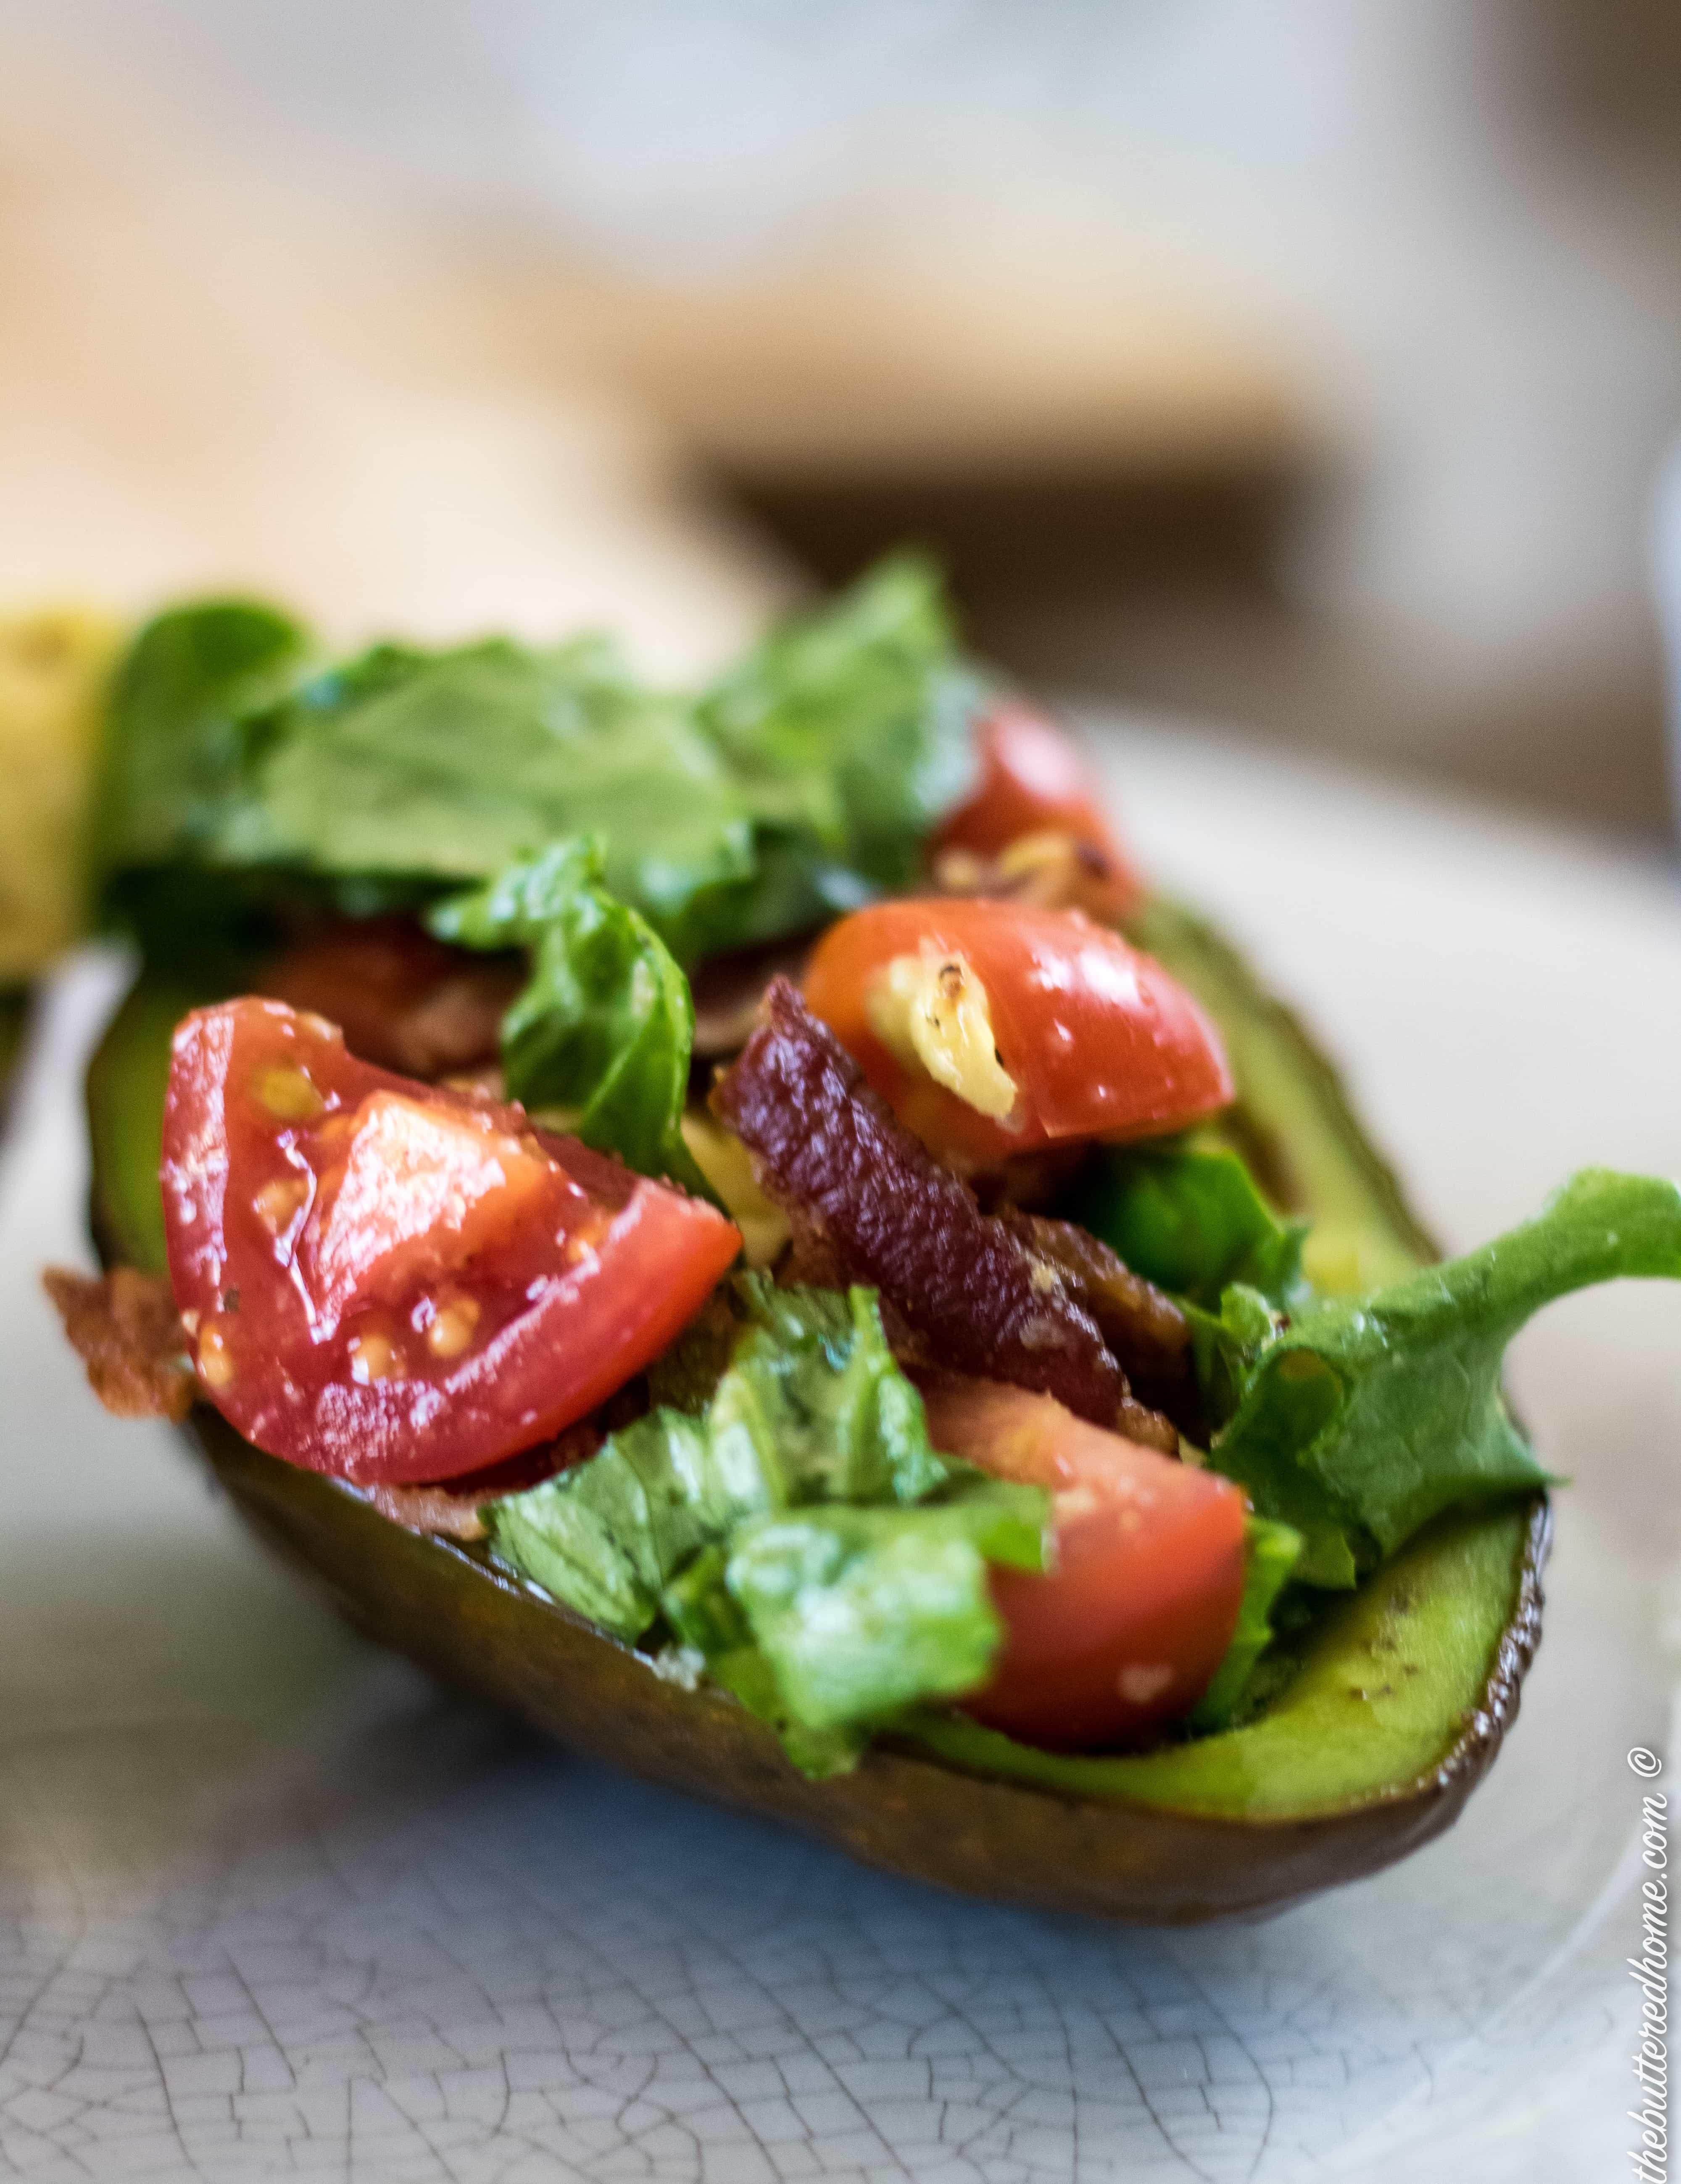 Baked BLT Avocados